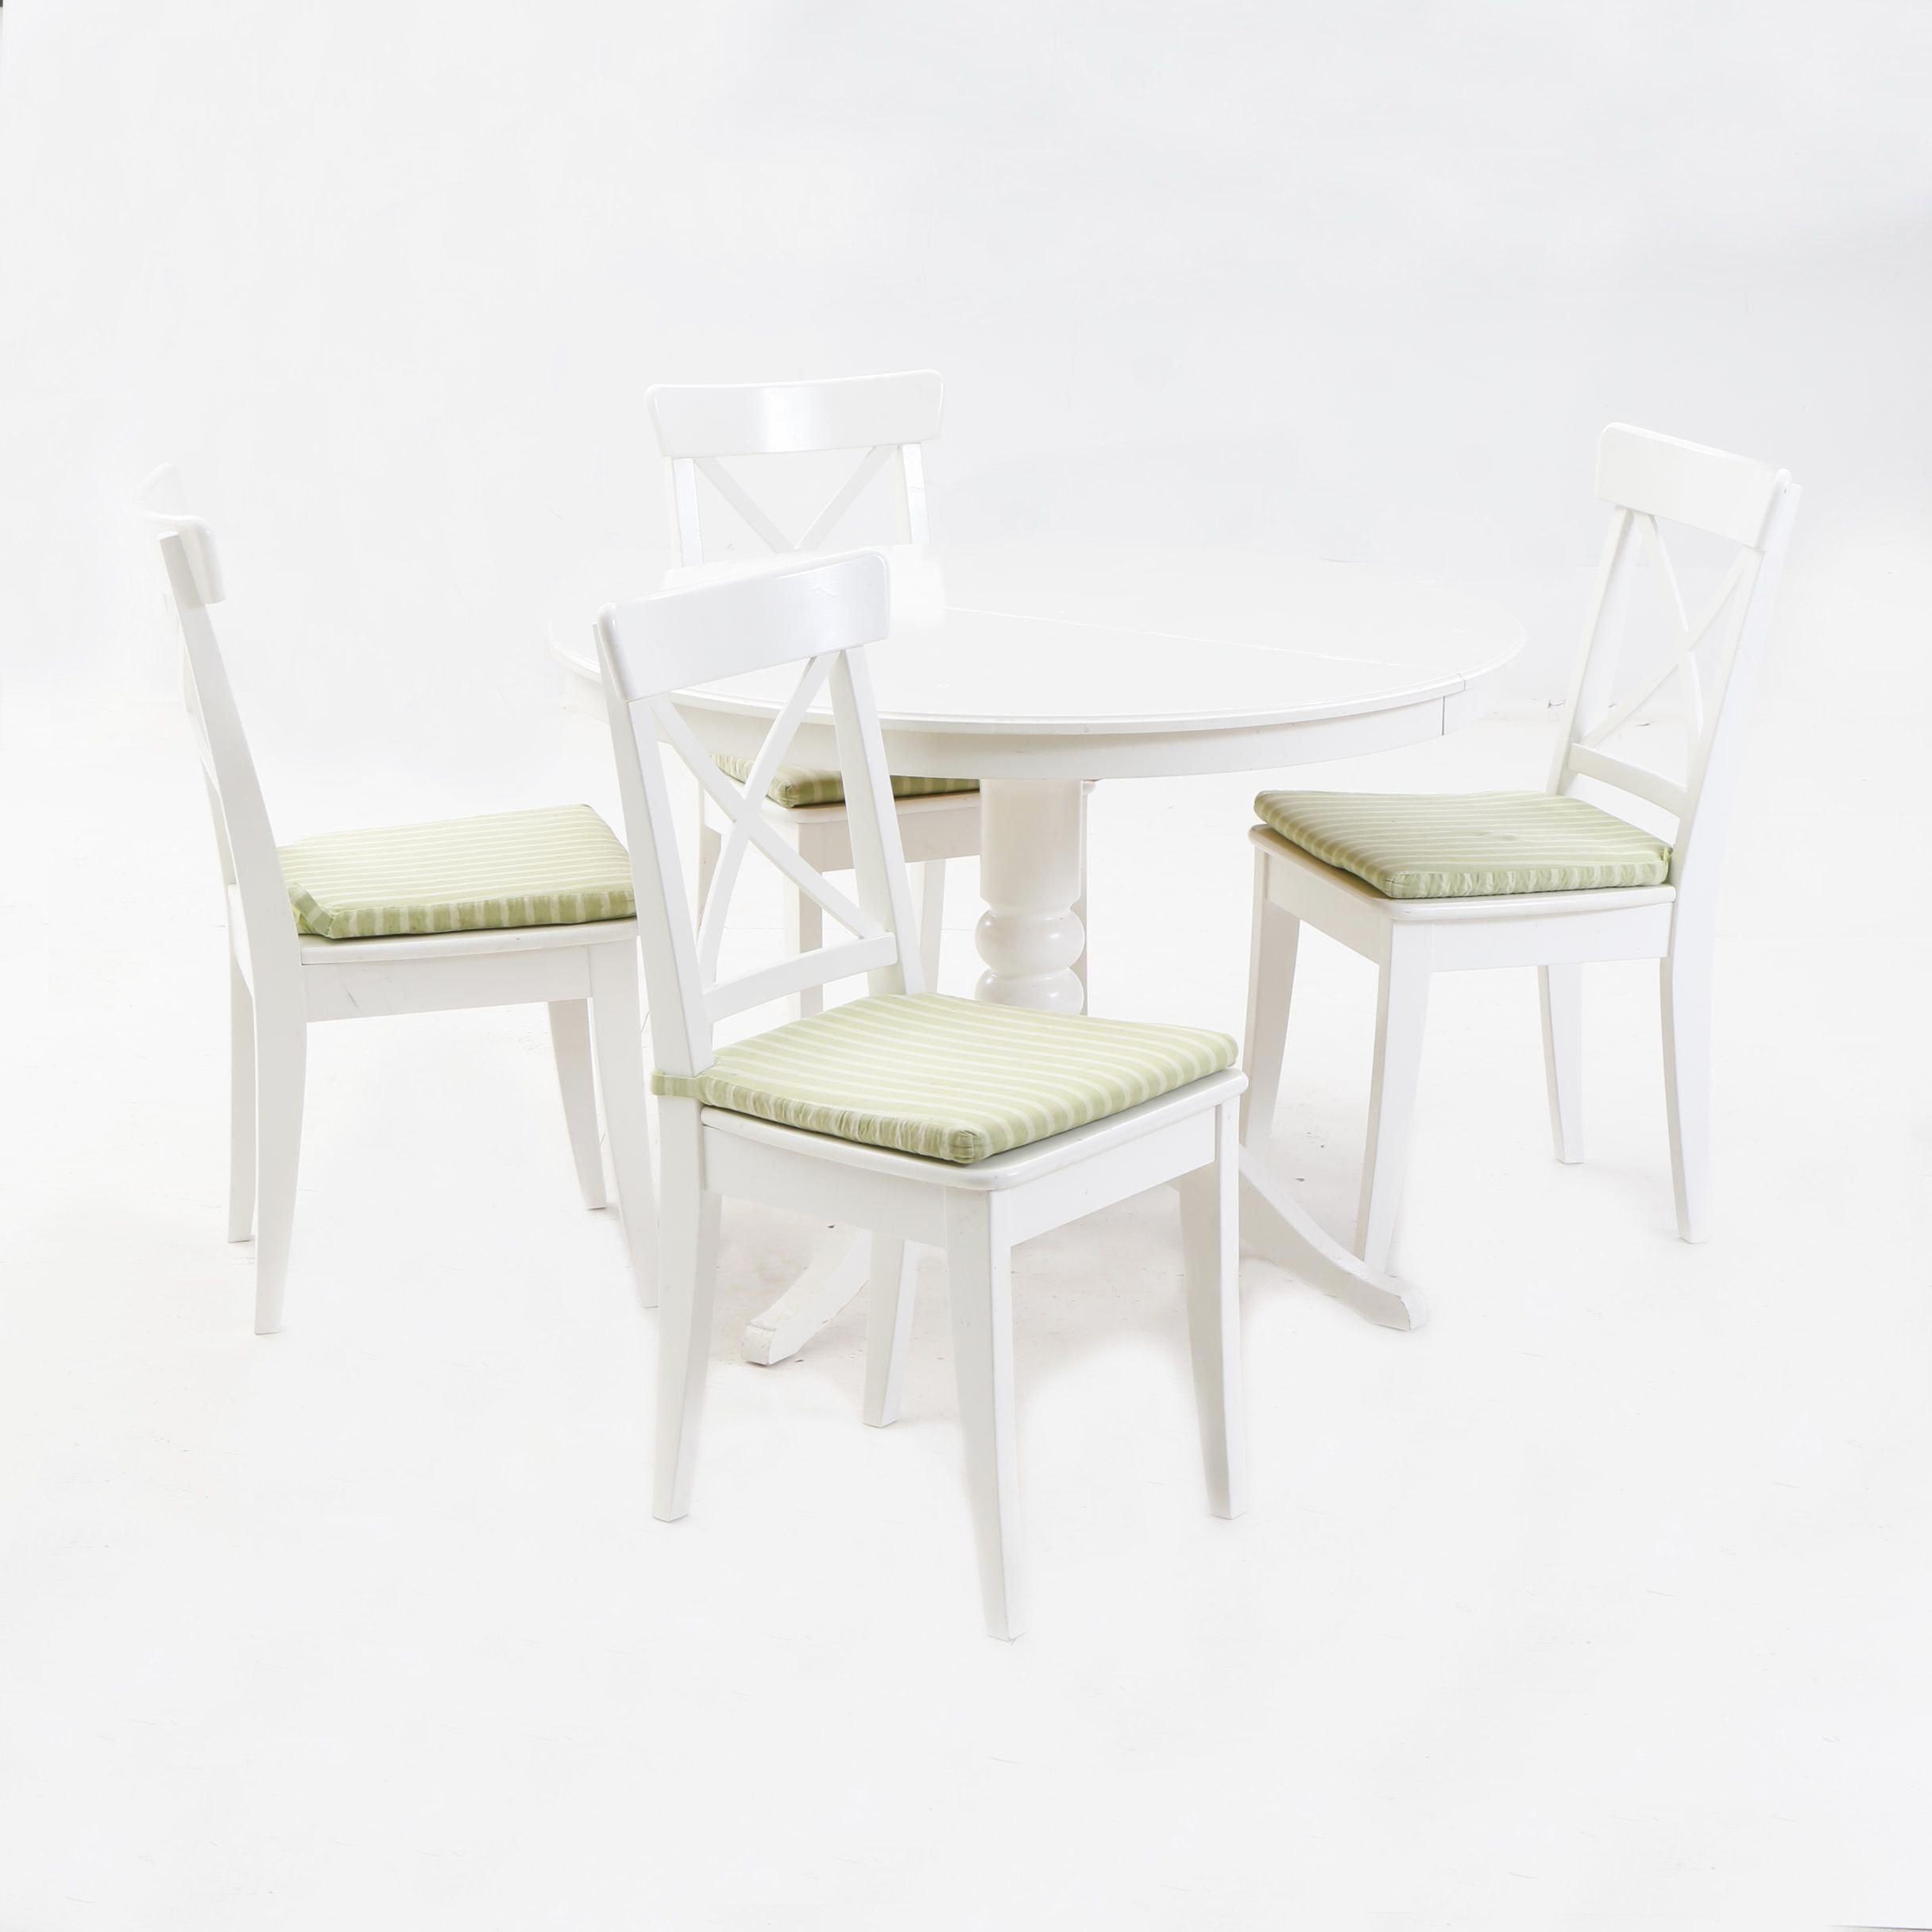 IKEA Ingolf Dinette Set in White